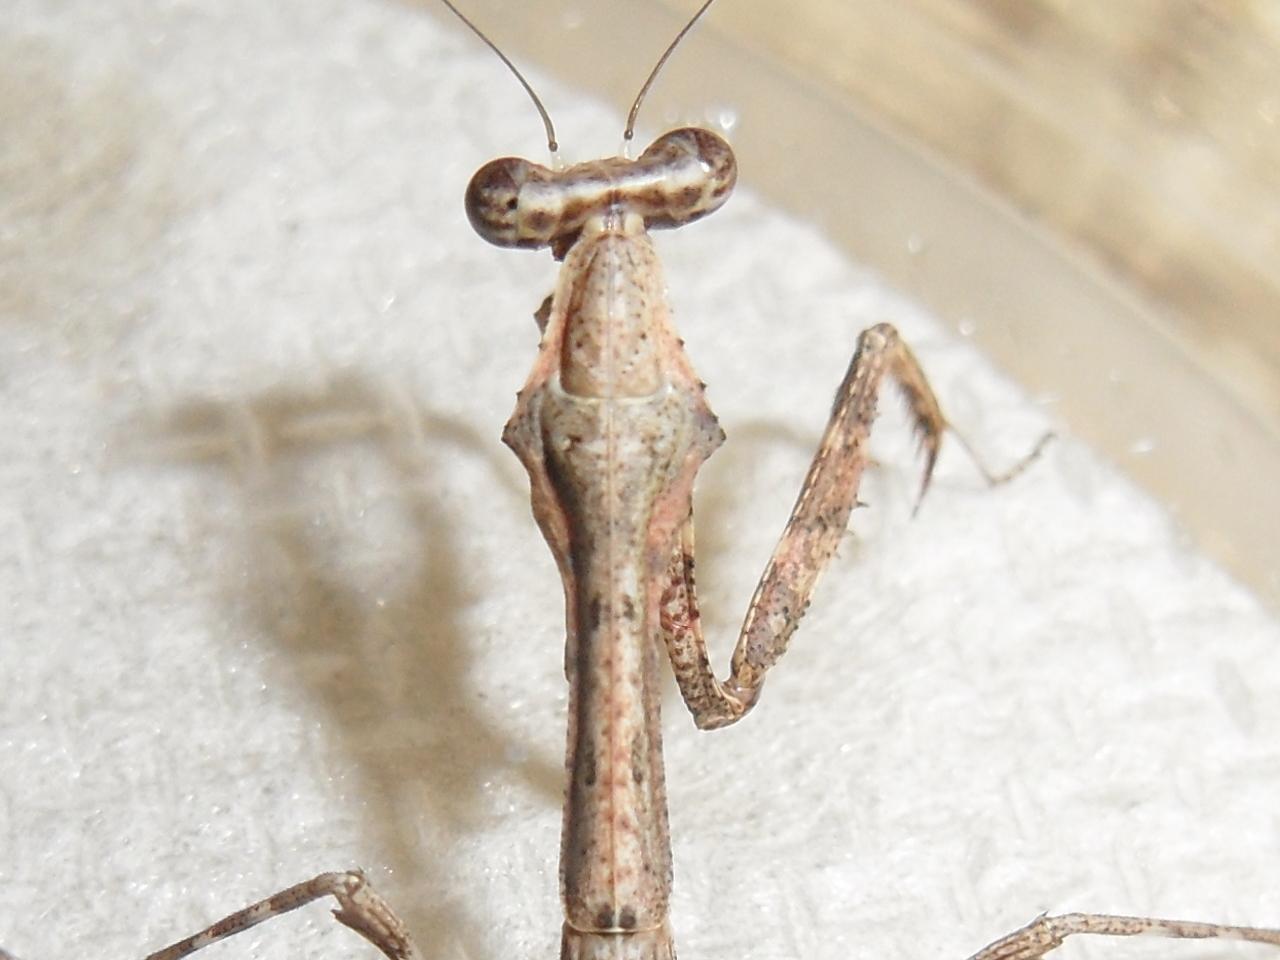 Image of Malaysian dead leaf mantis